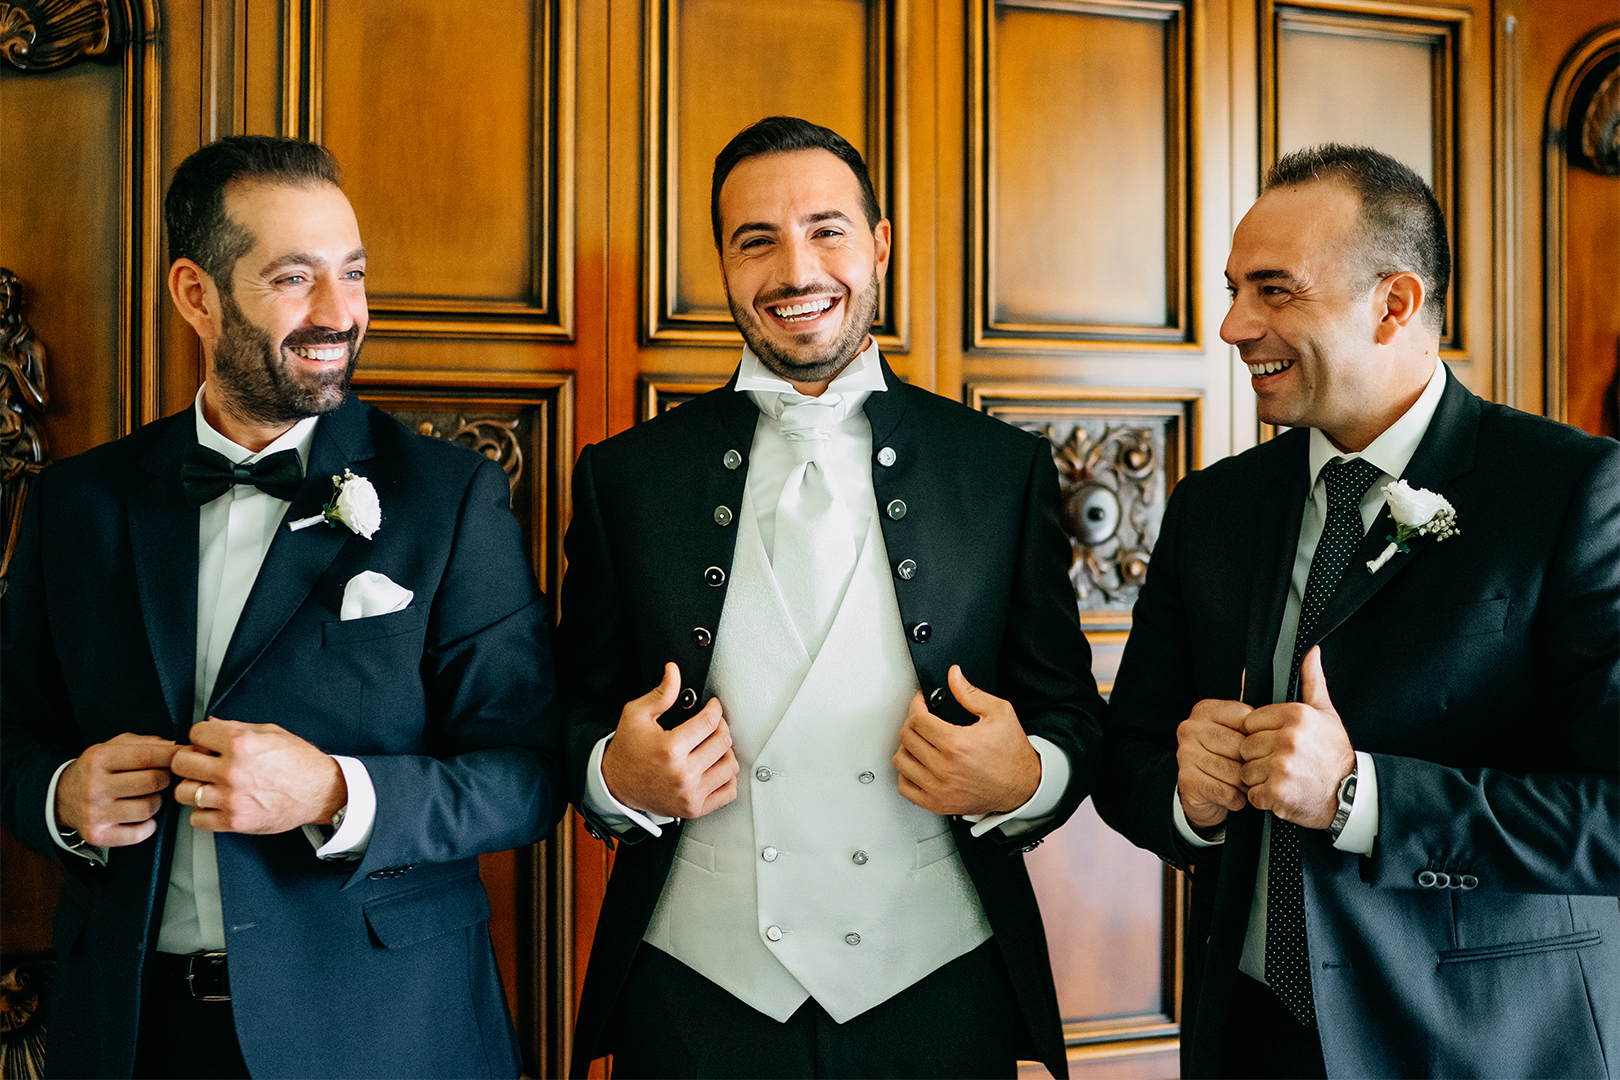 11 gianni-lepore-fratelli-sposo